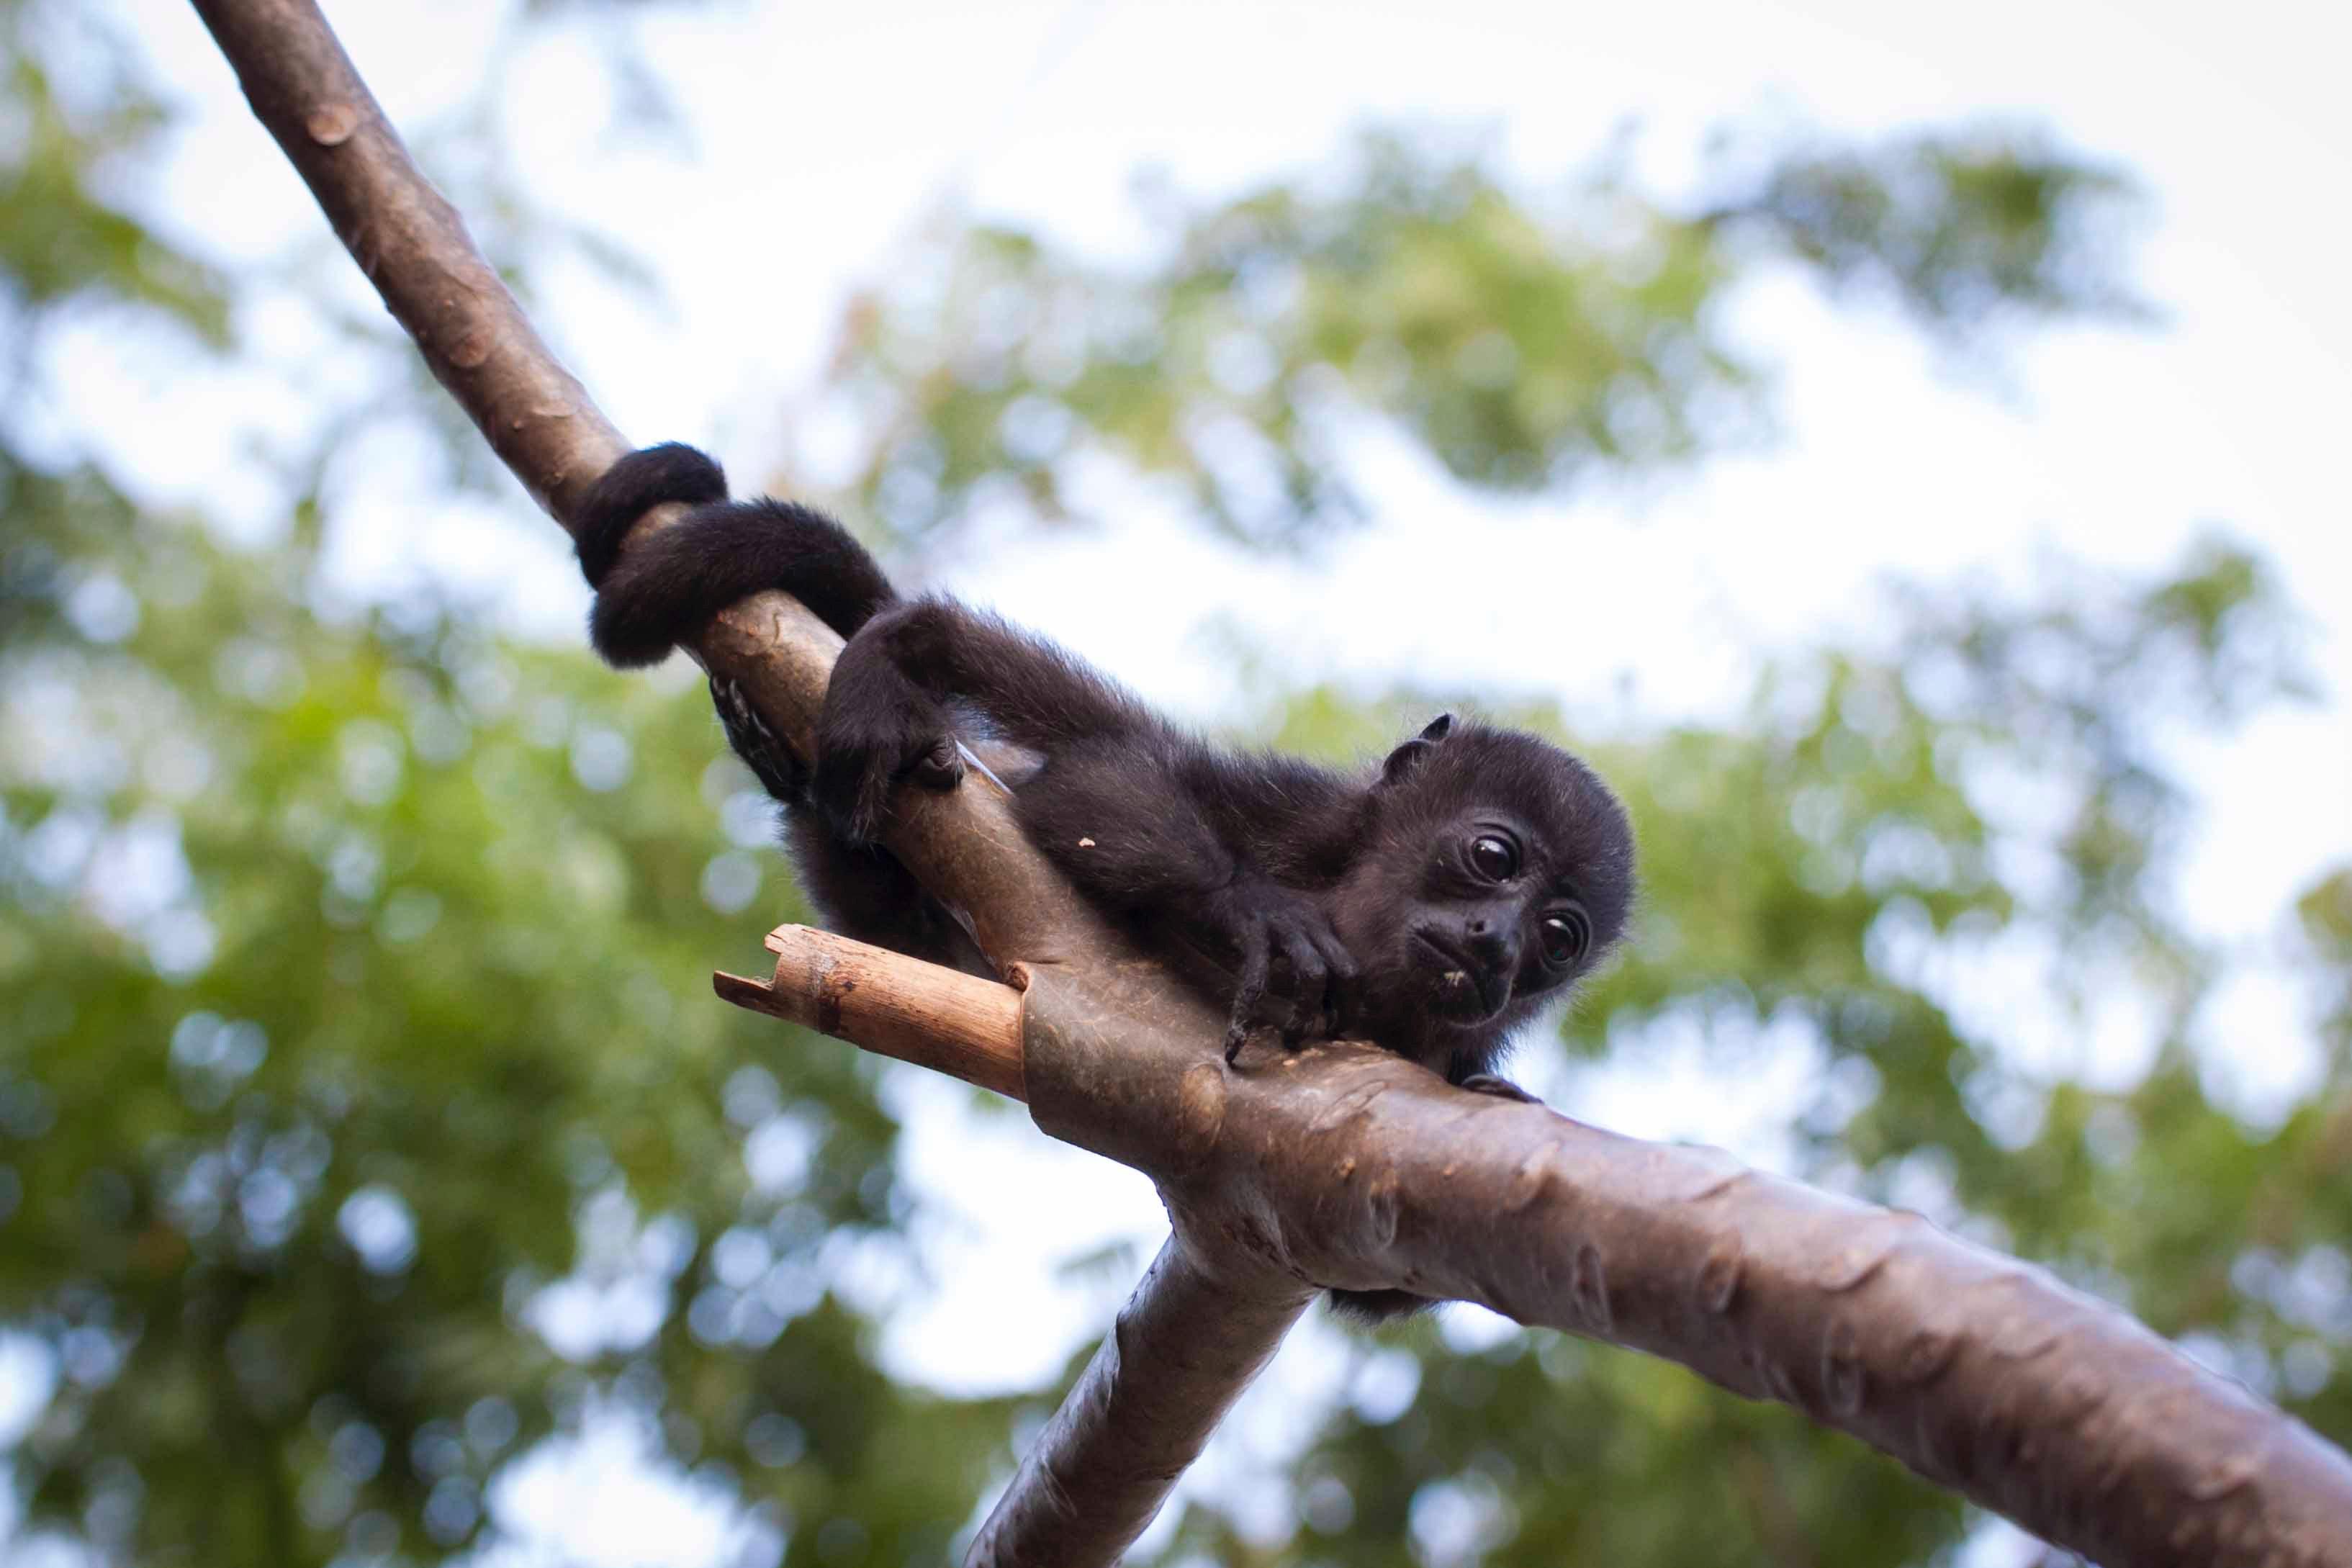 Black monkey hugging tree branch photo